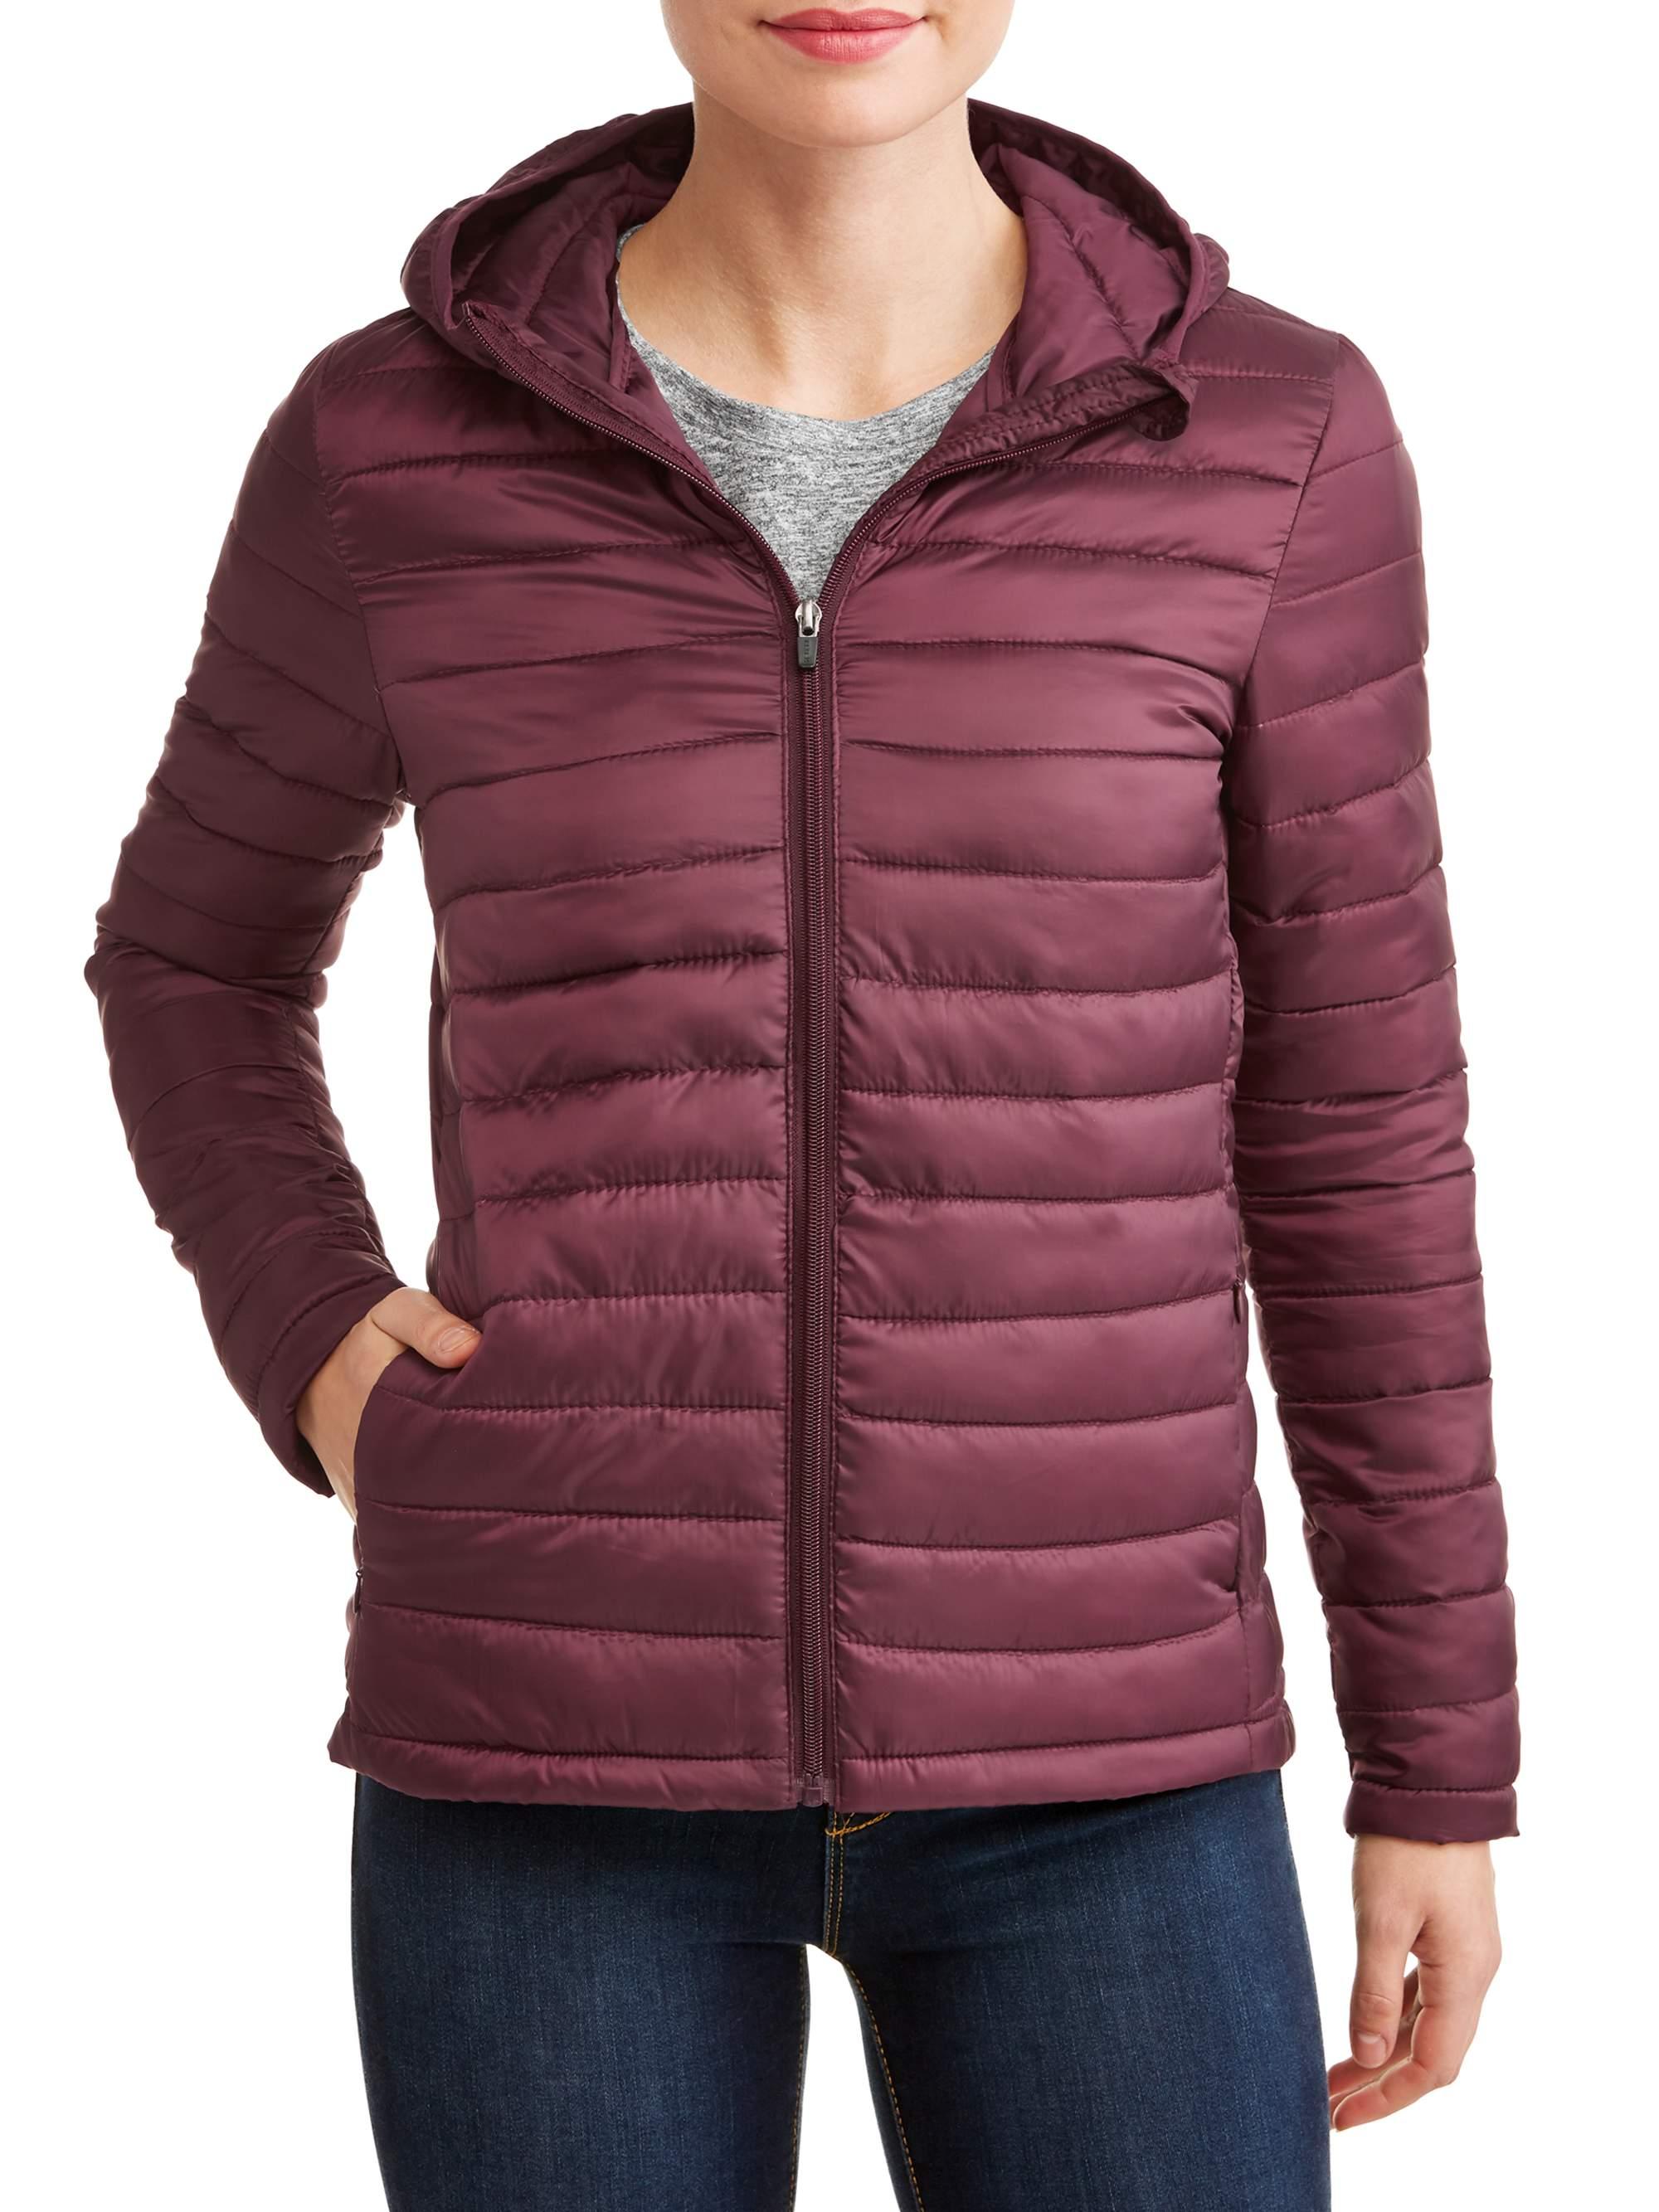 Women's Active Quilt Packable Puffer Jacket